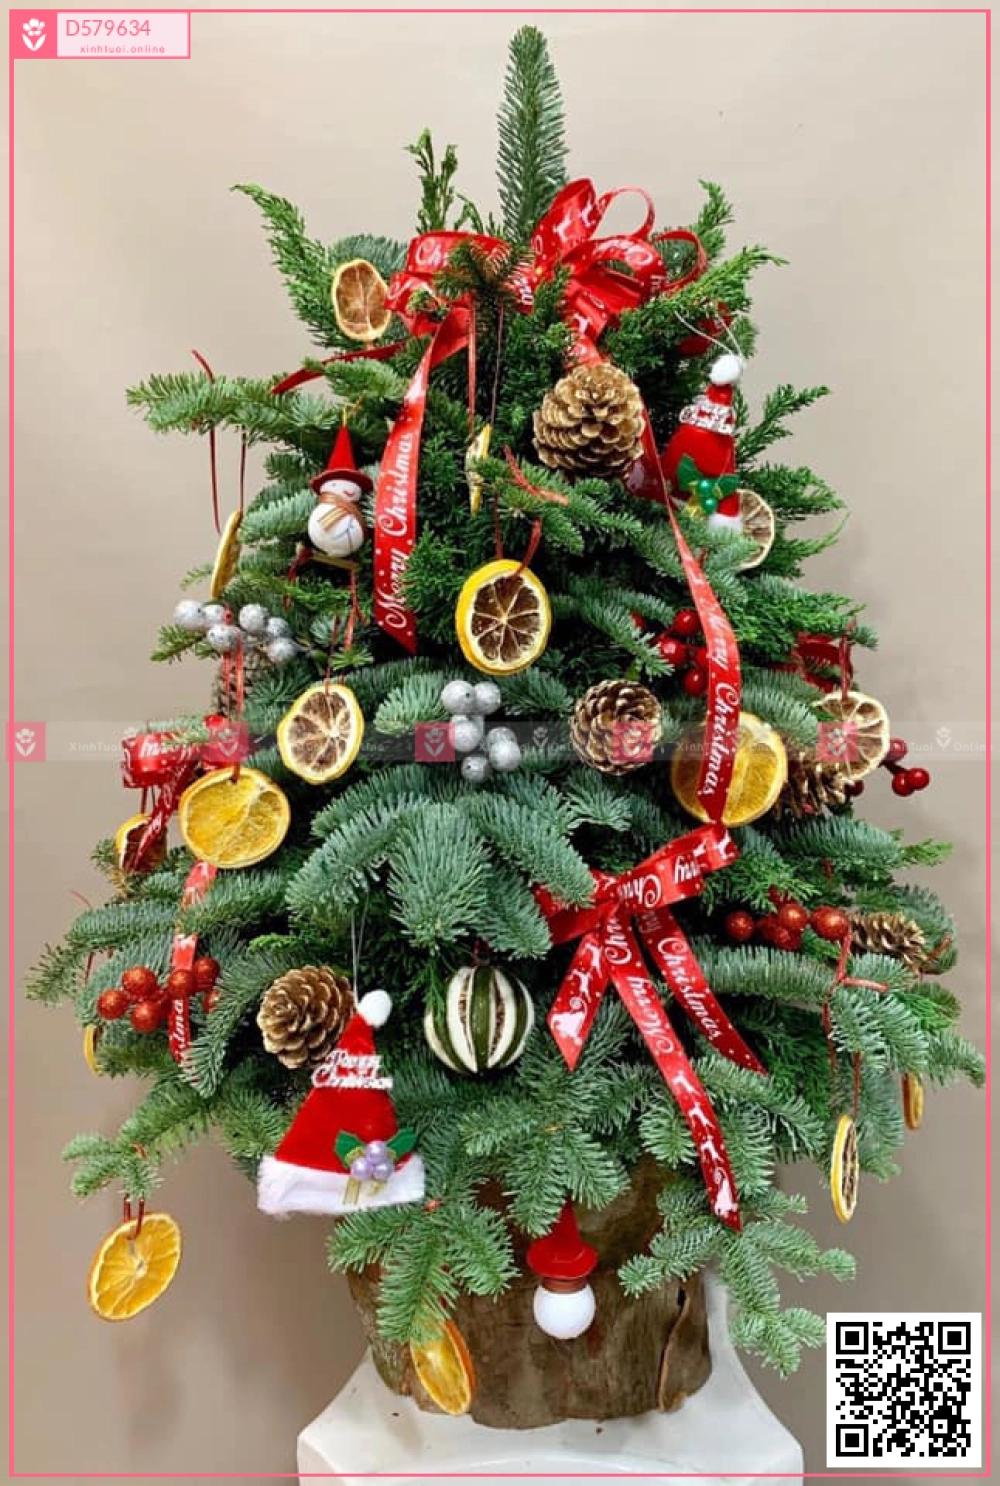 Santa claus - D579634 - xinhtuoi.online